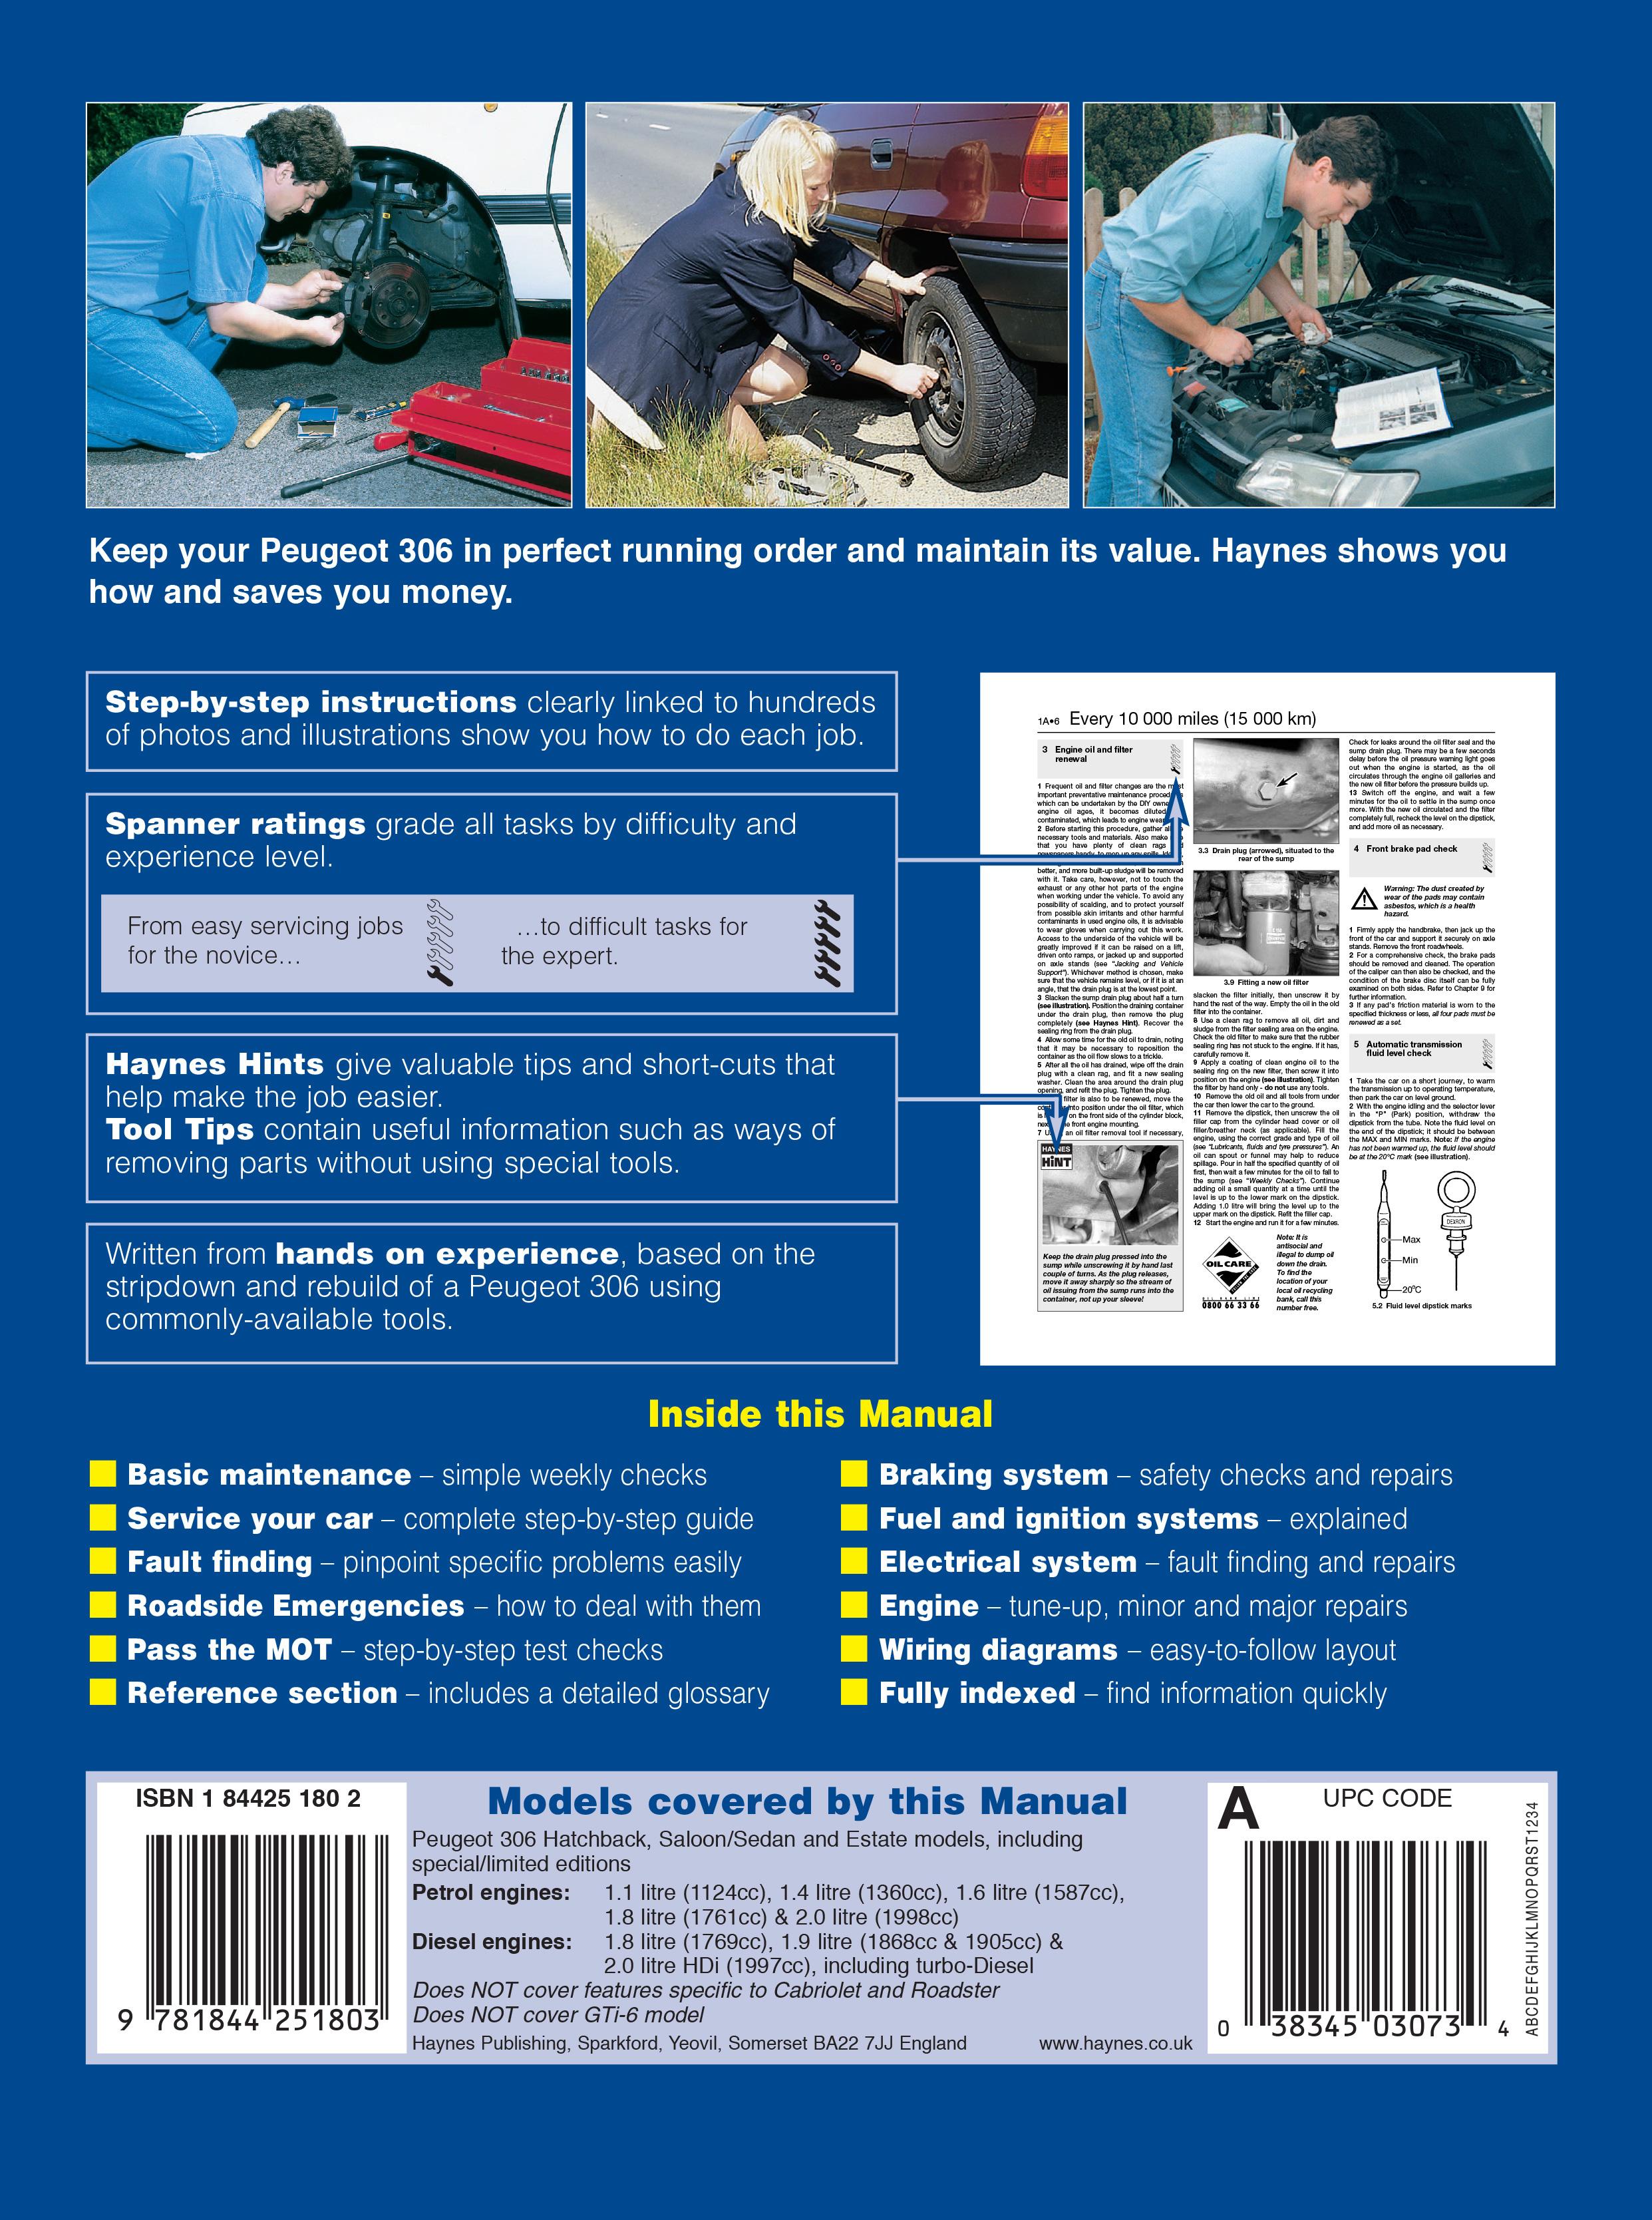 peugeot 306 haynes manual pdf free